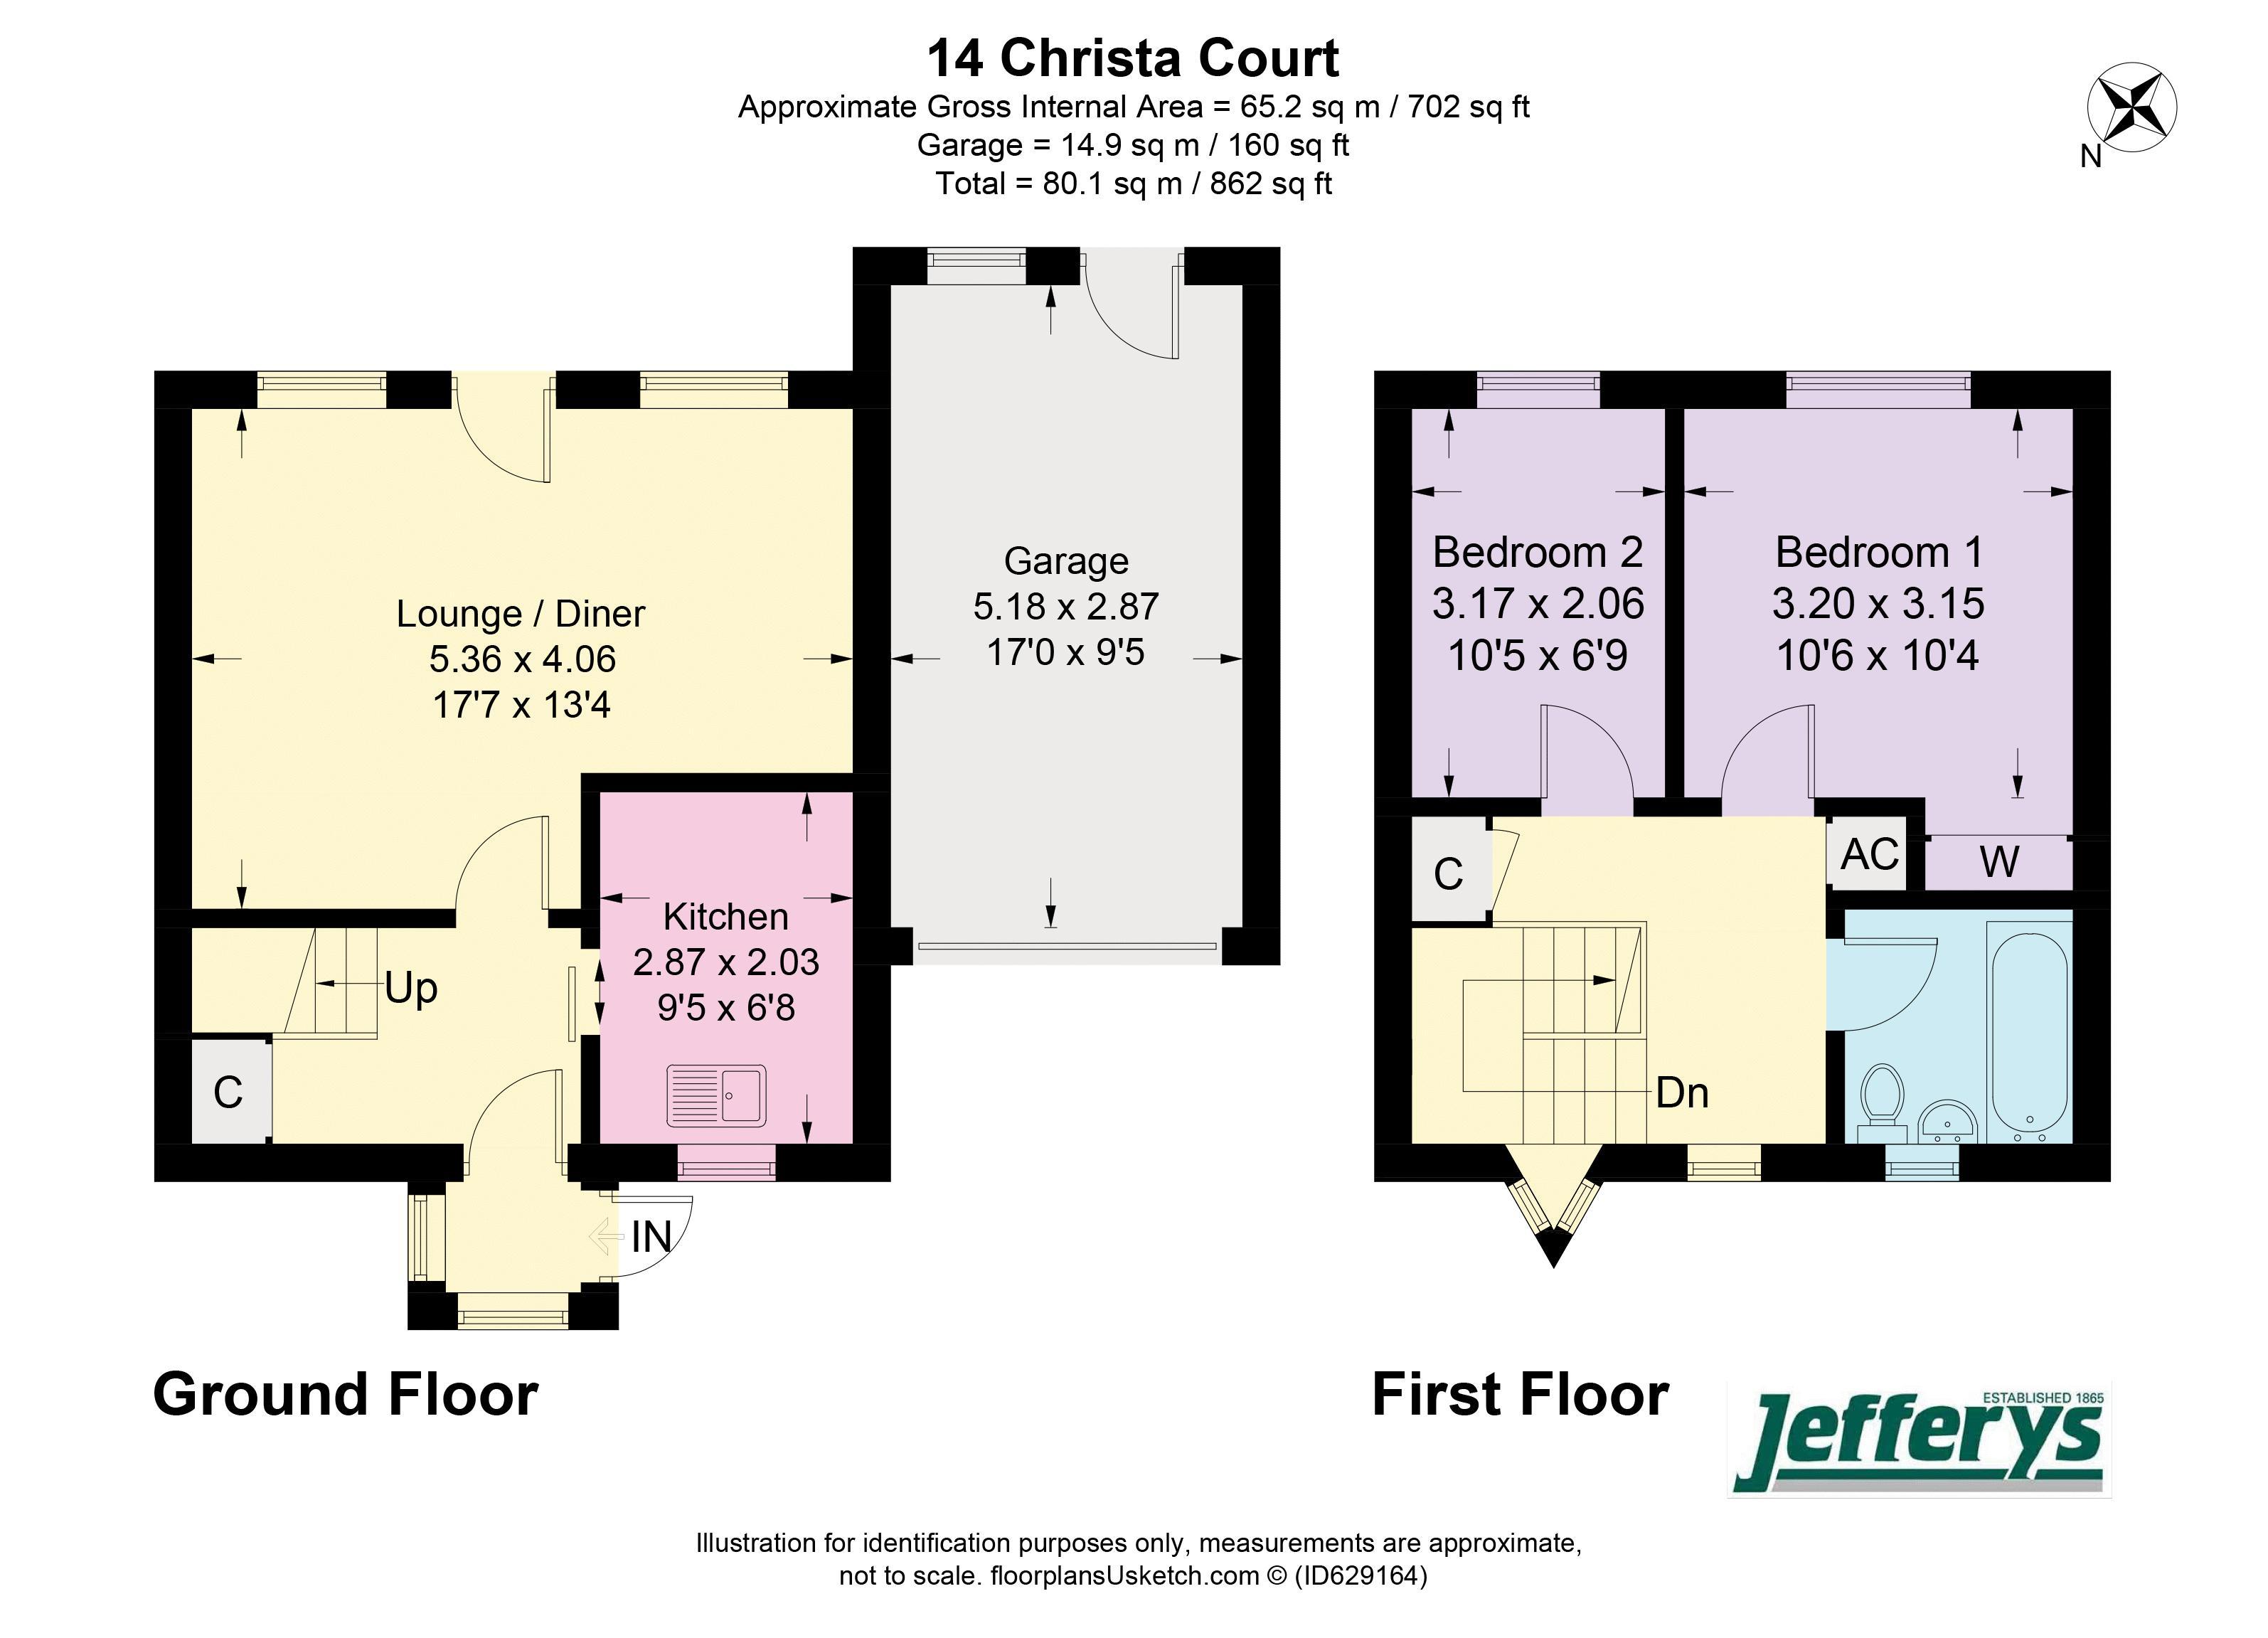 Christa Court Upton Cross